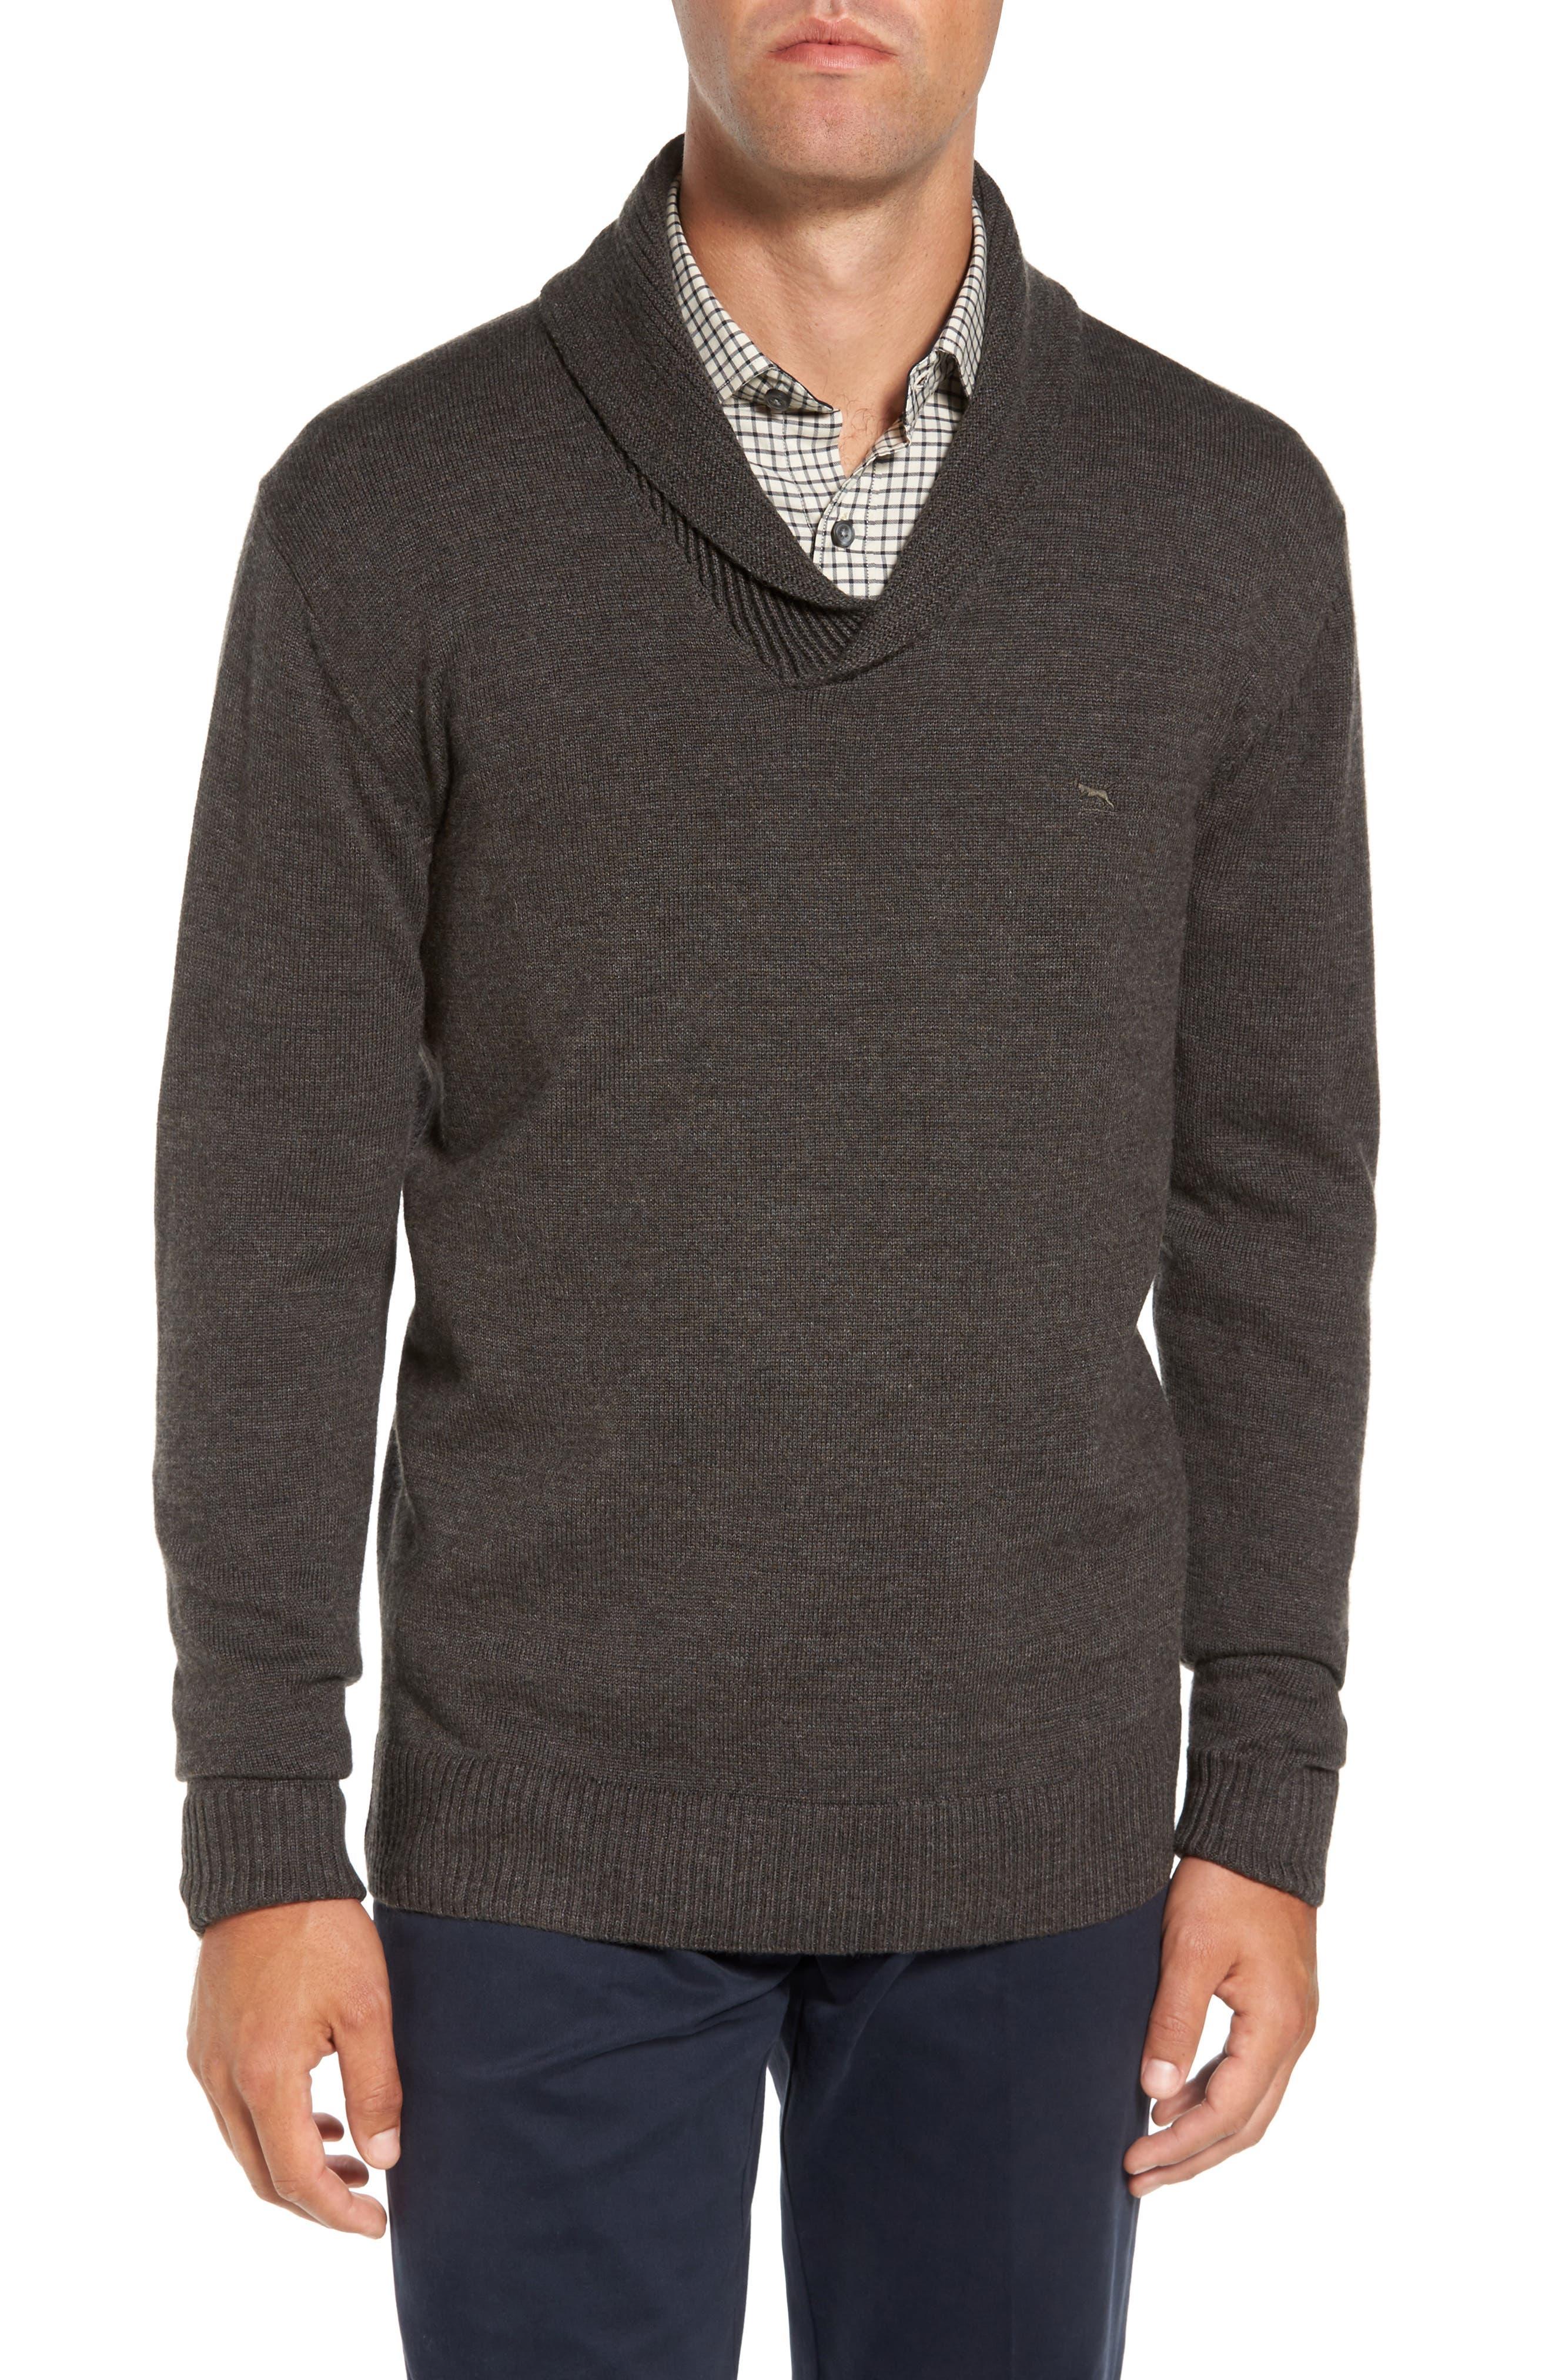 PT Chevalier Shawl Collar Sweater,                             Main thumbnail 1, color,                             202